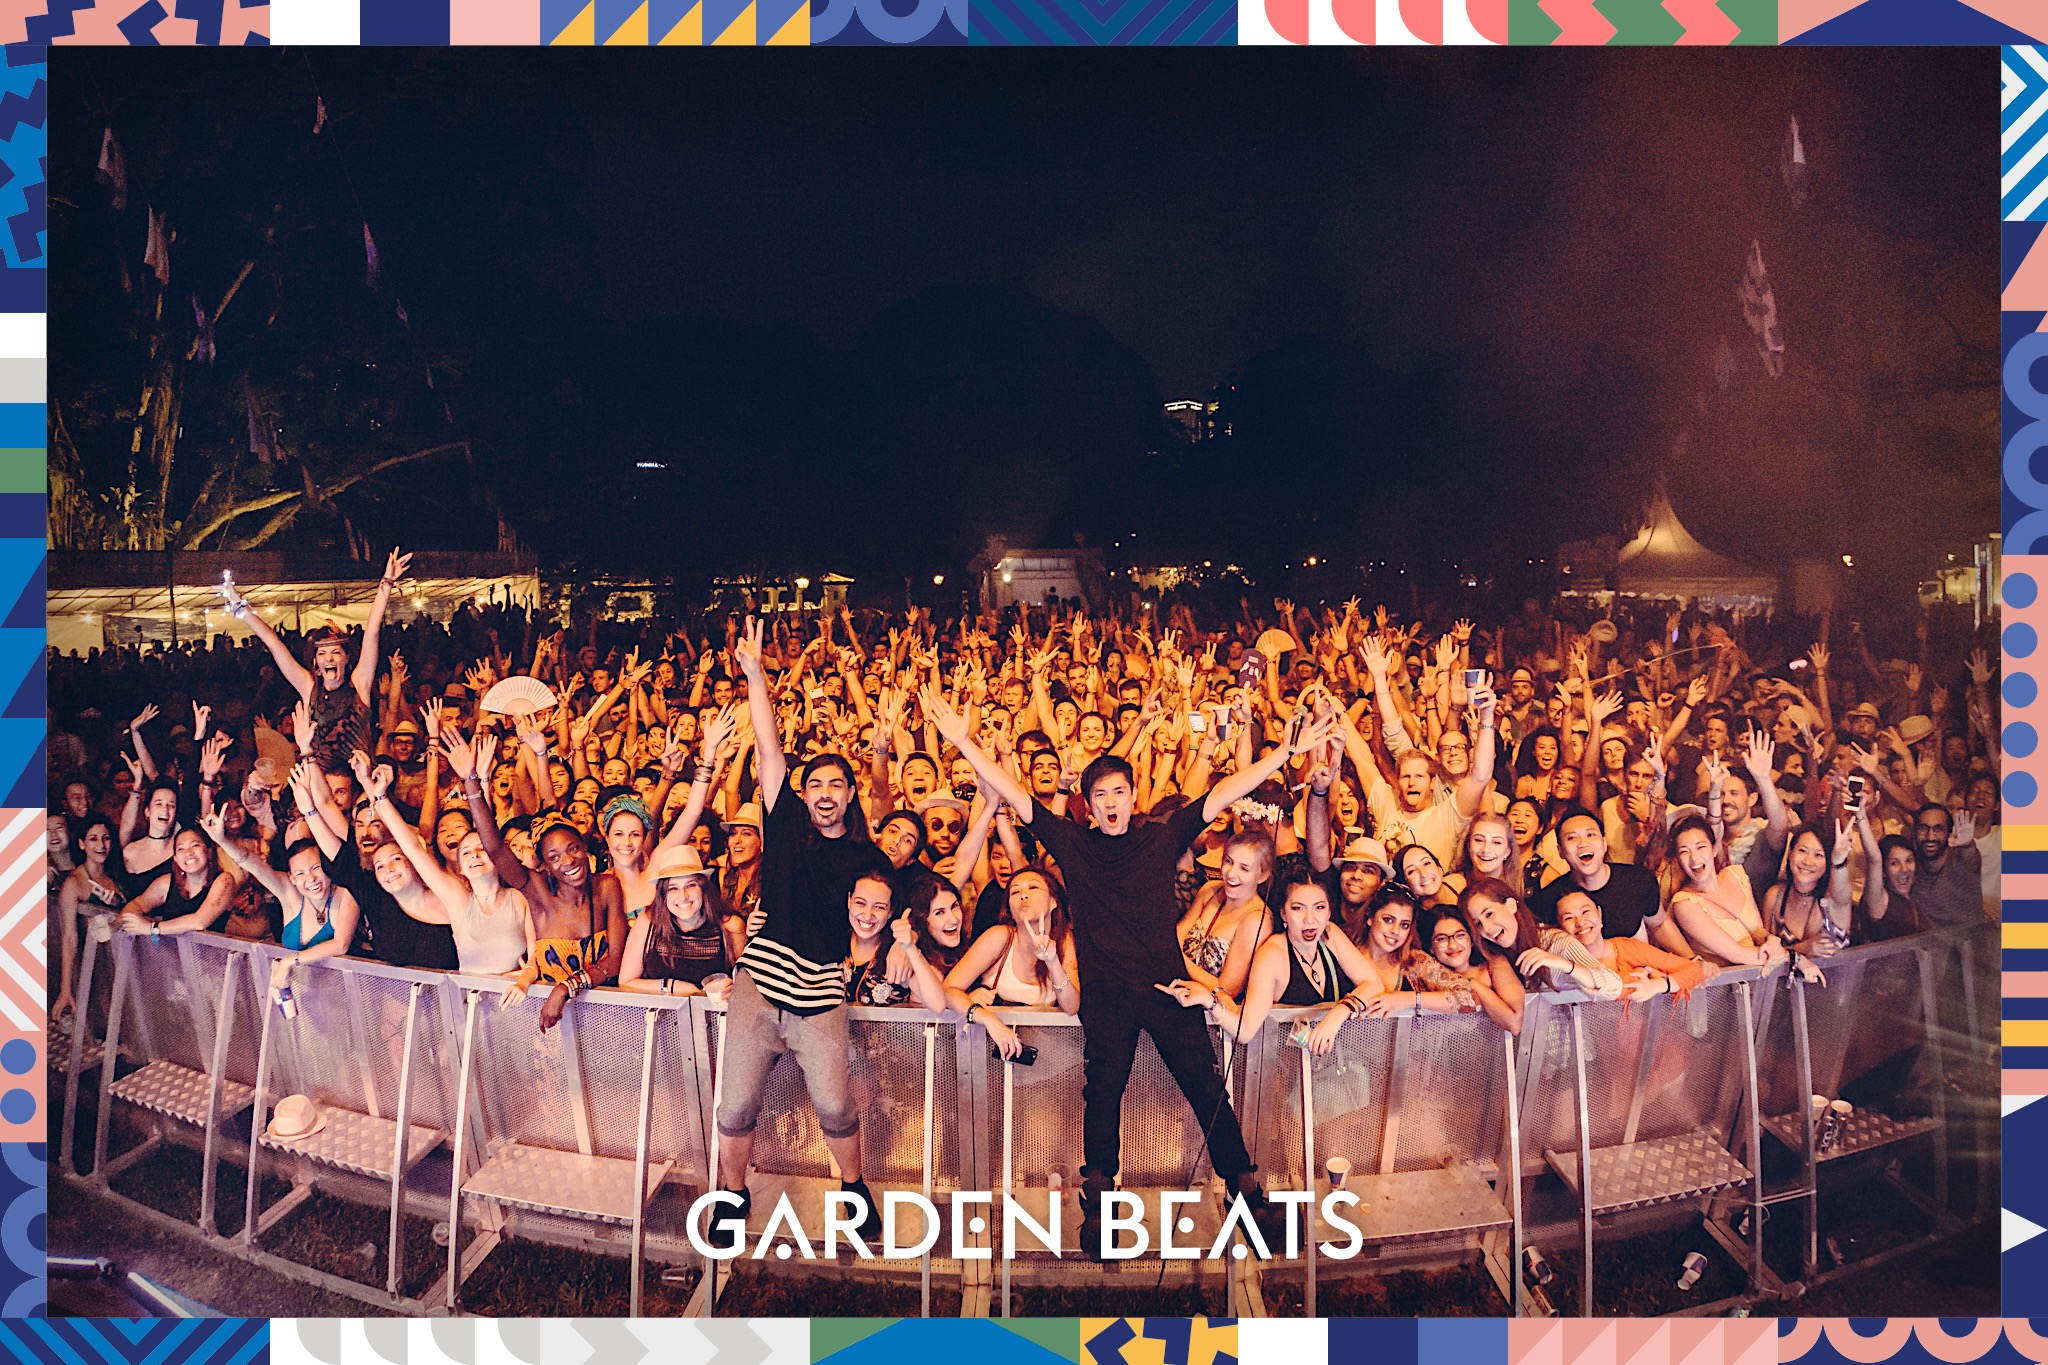 18032017_GardenBeats_Colossal819_WatermarkedGB.jpg